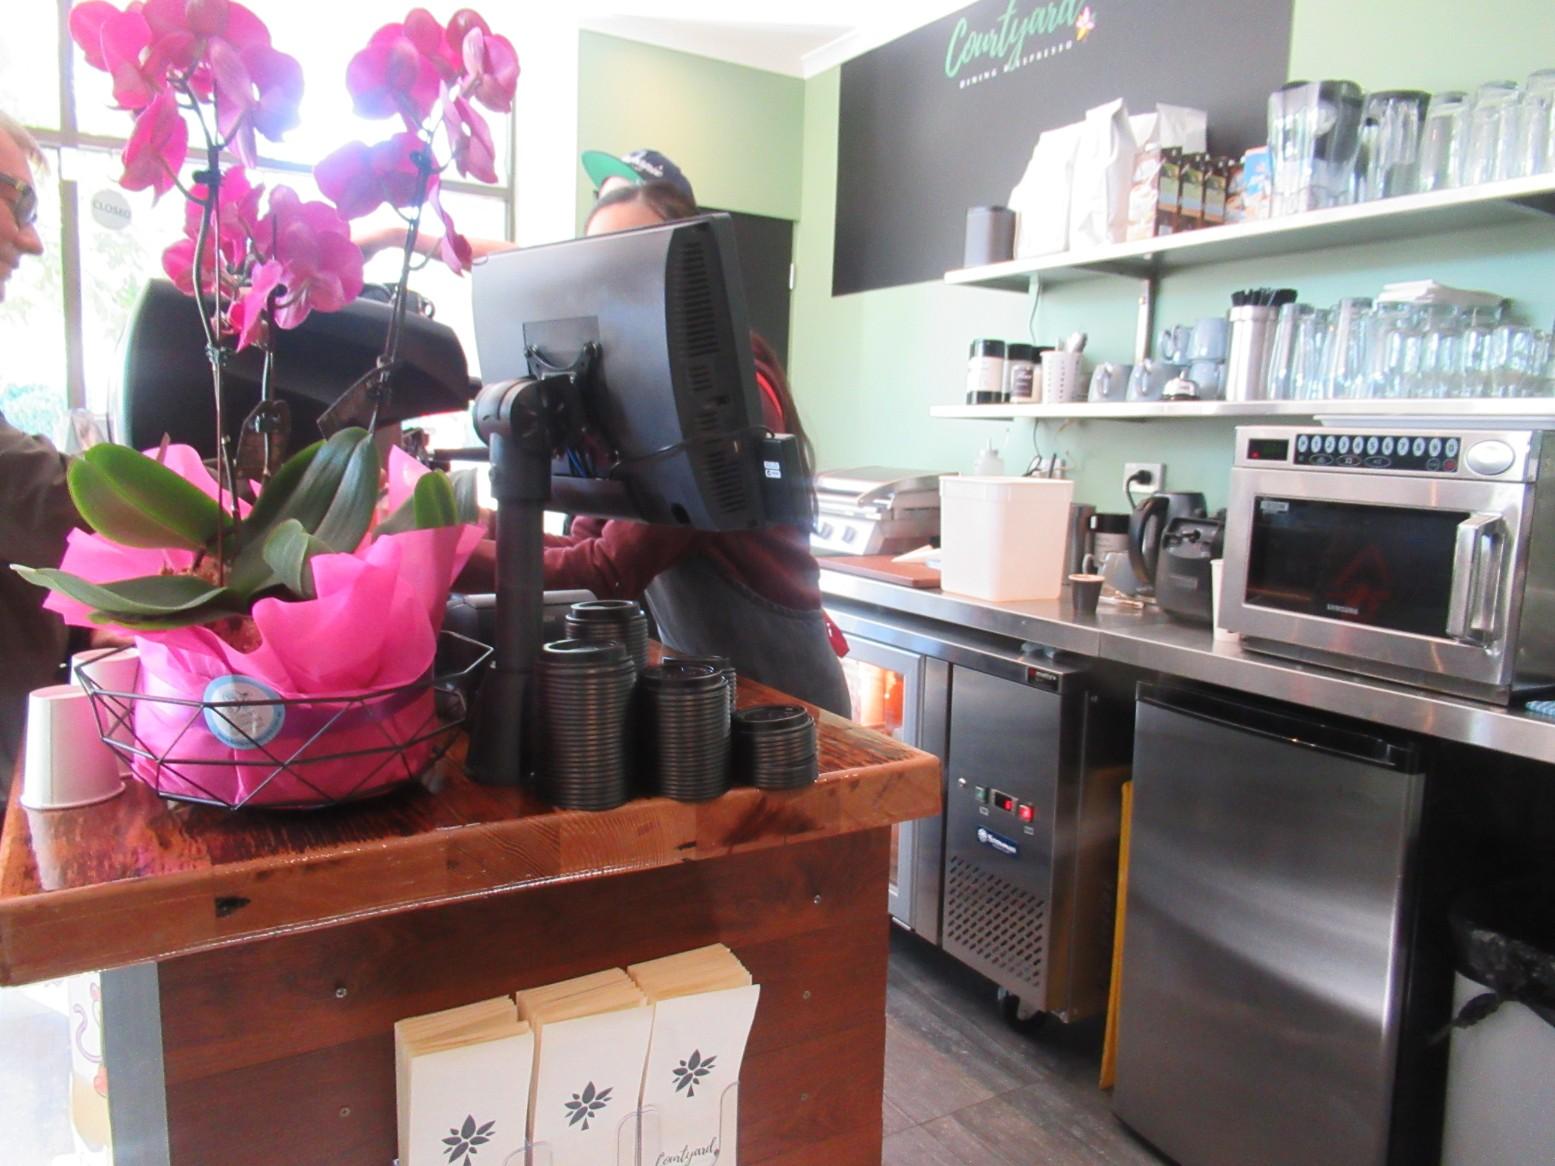 courtyard dining espresso parraparents. Black Bedroom Furniture Sets. Home Design Ideas